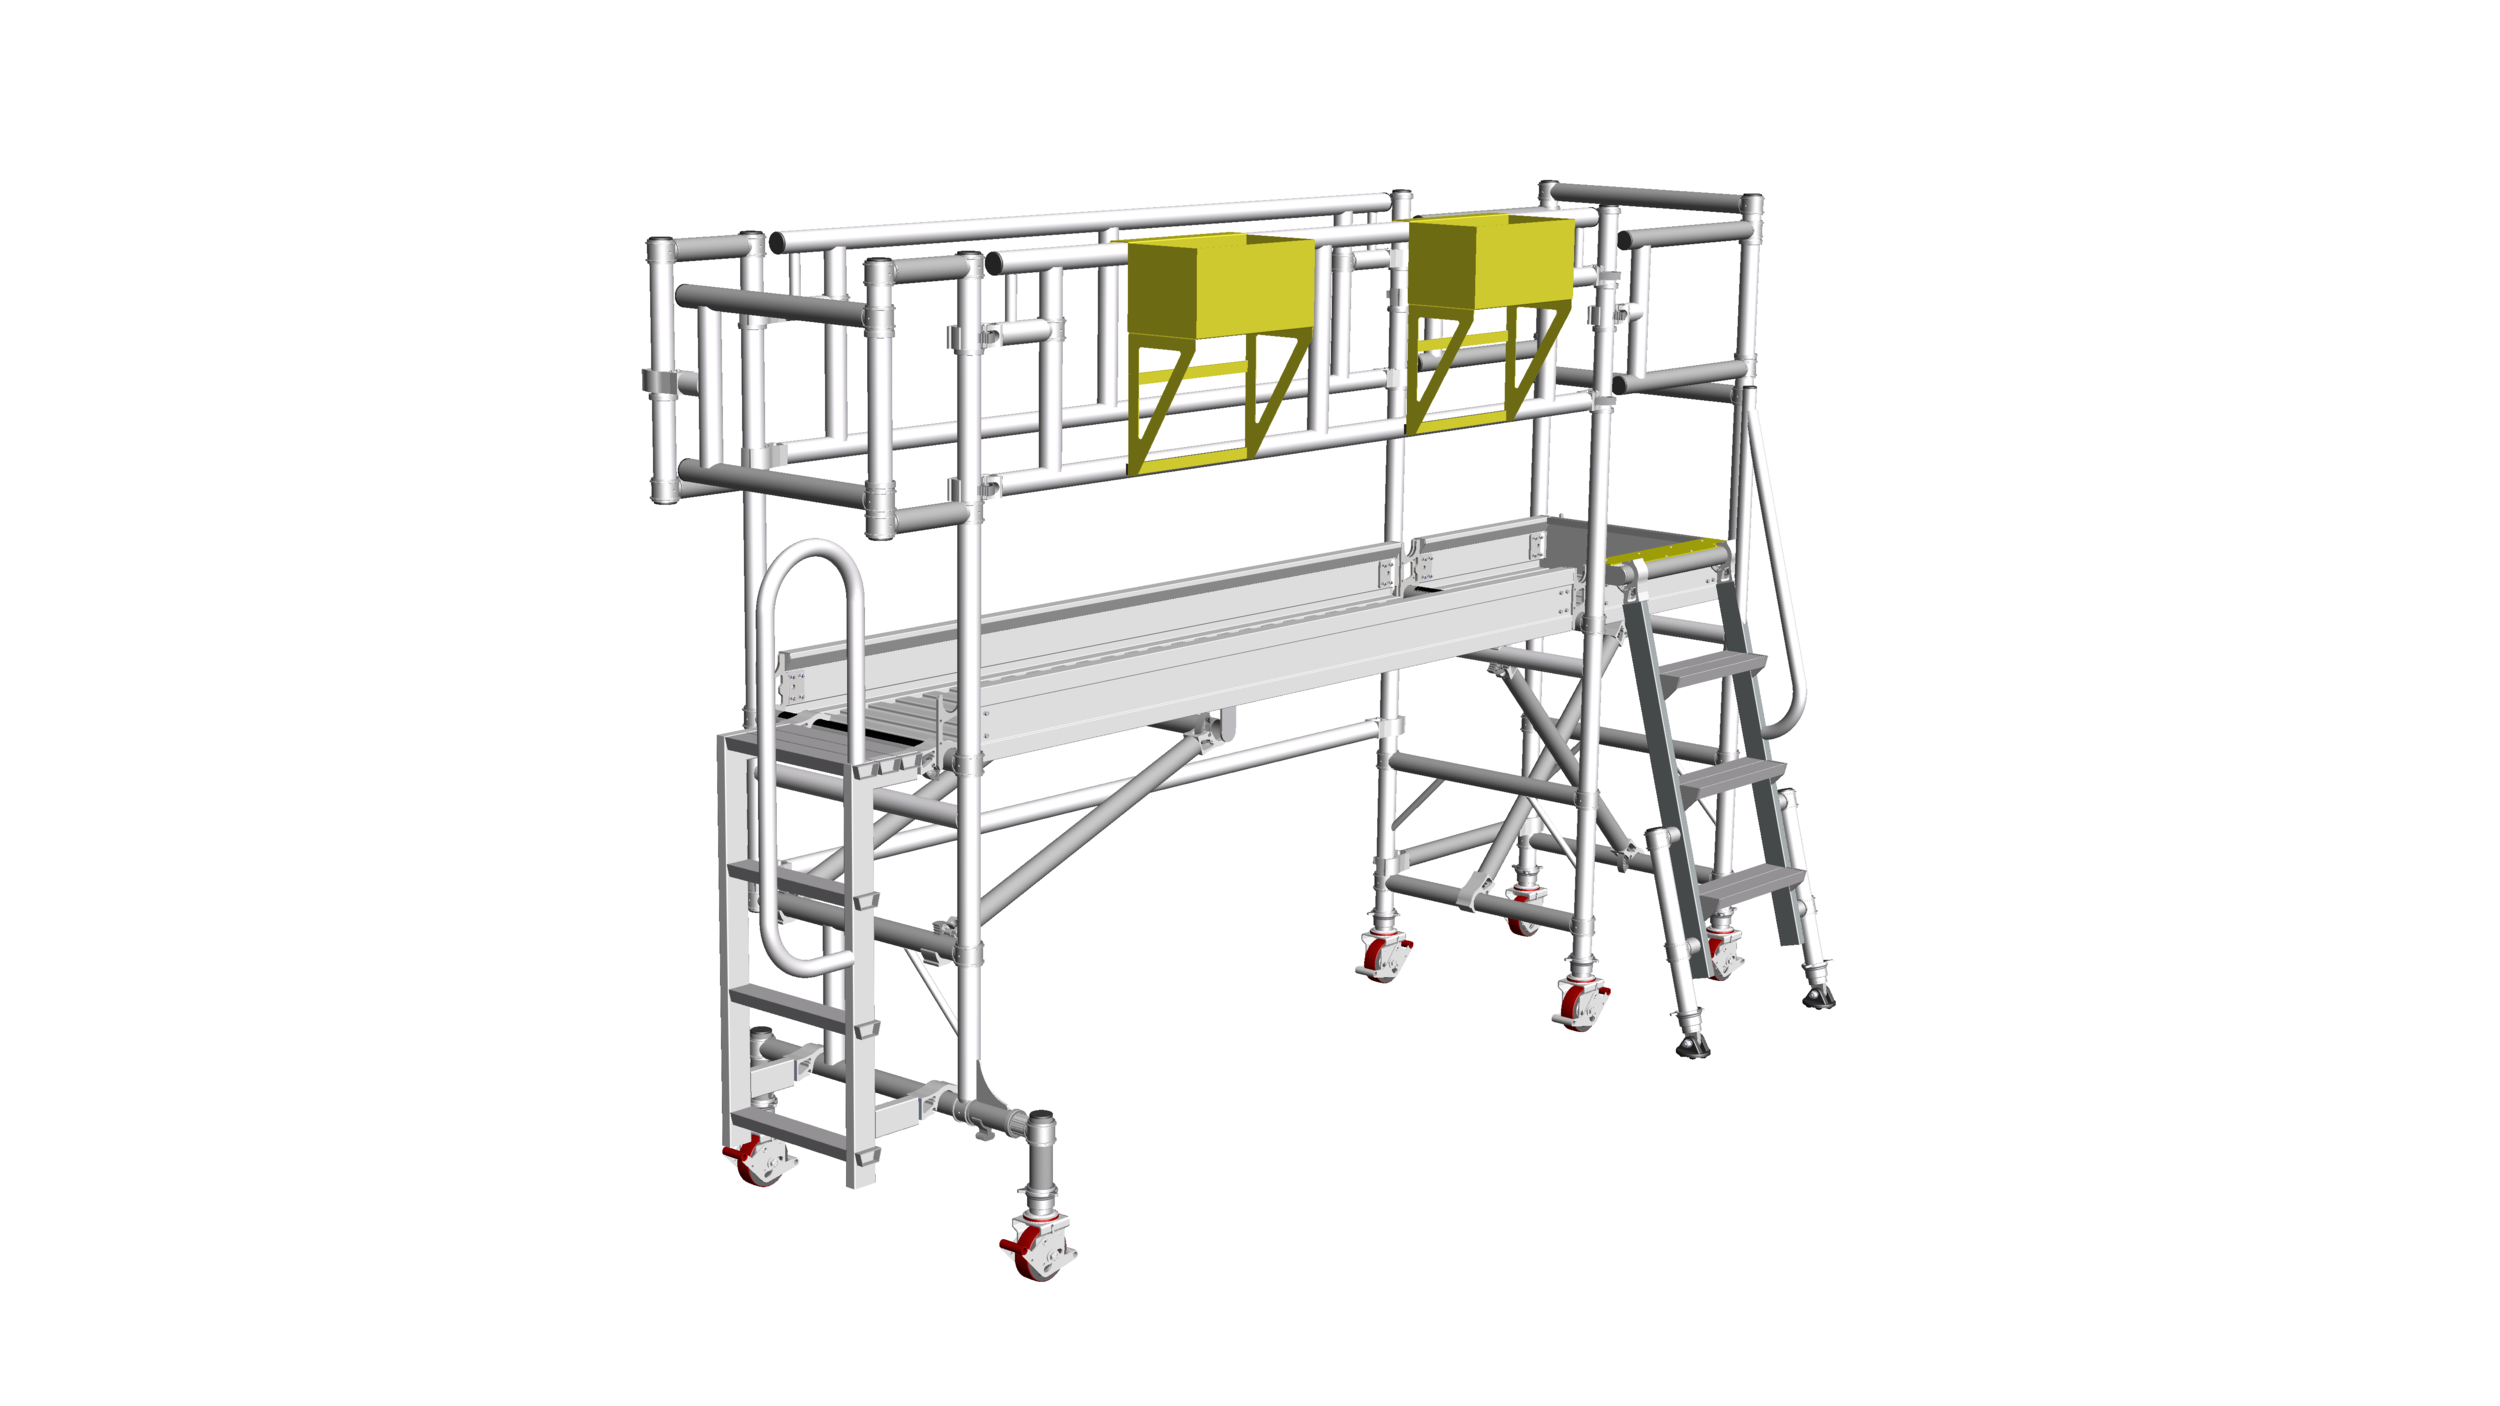 38. Access platform